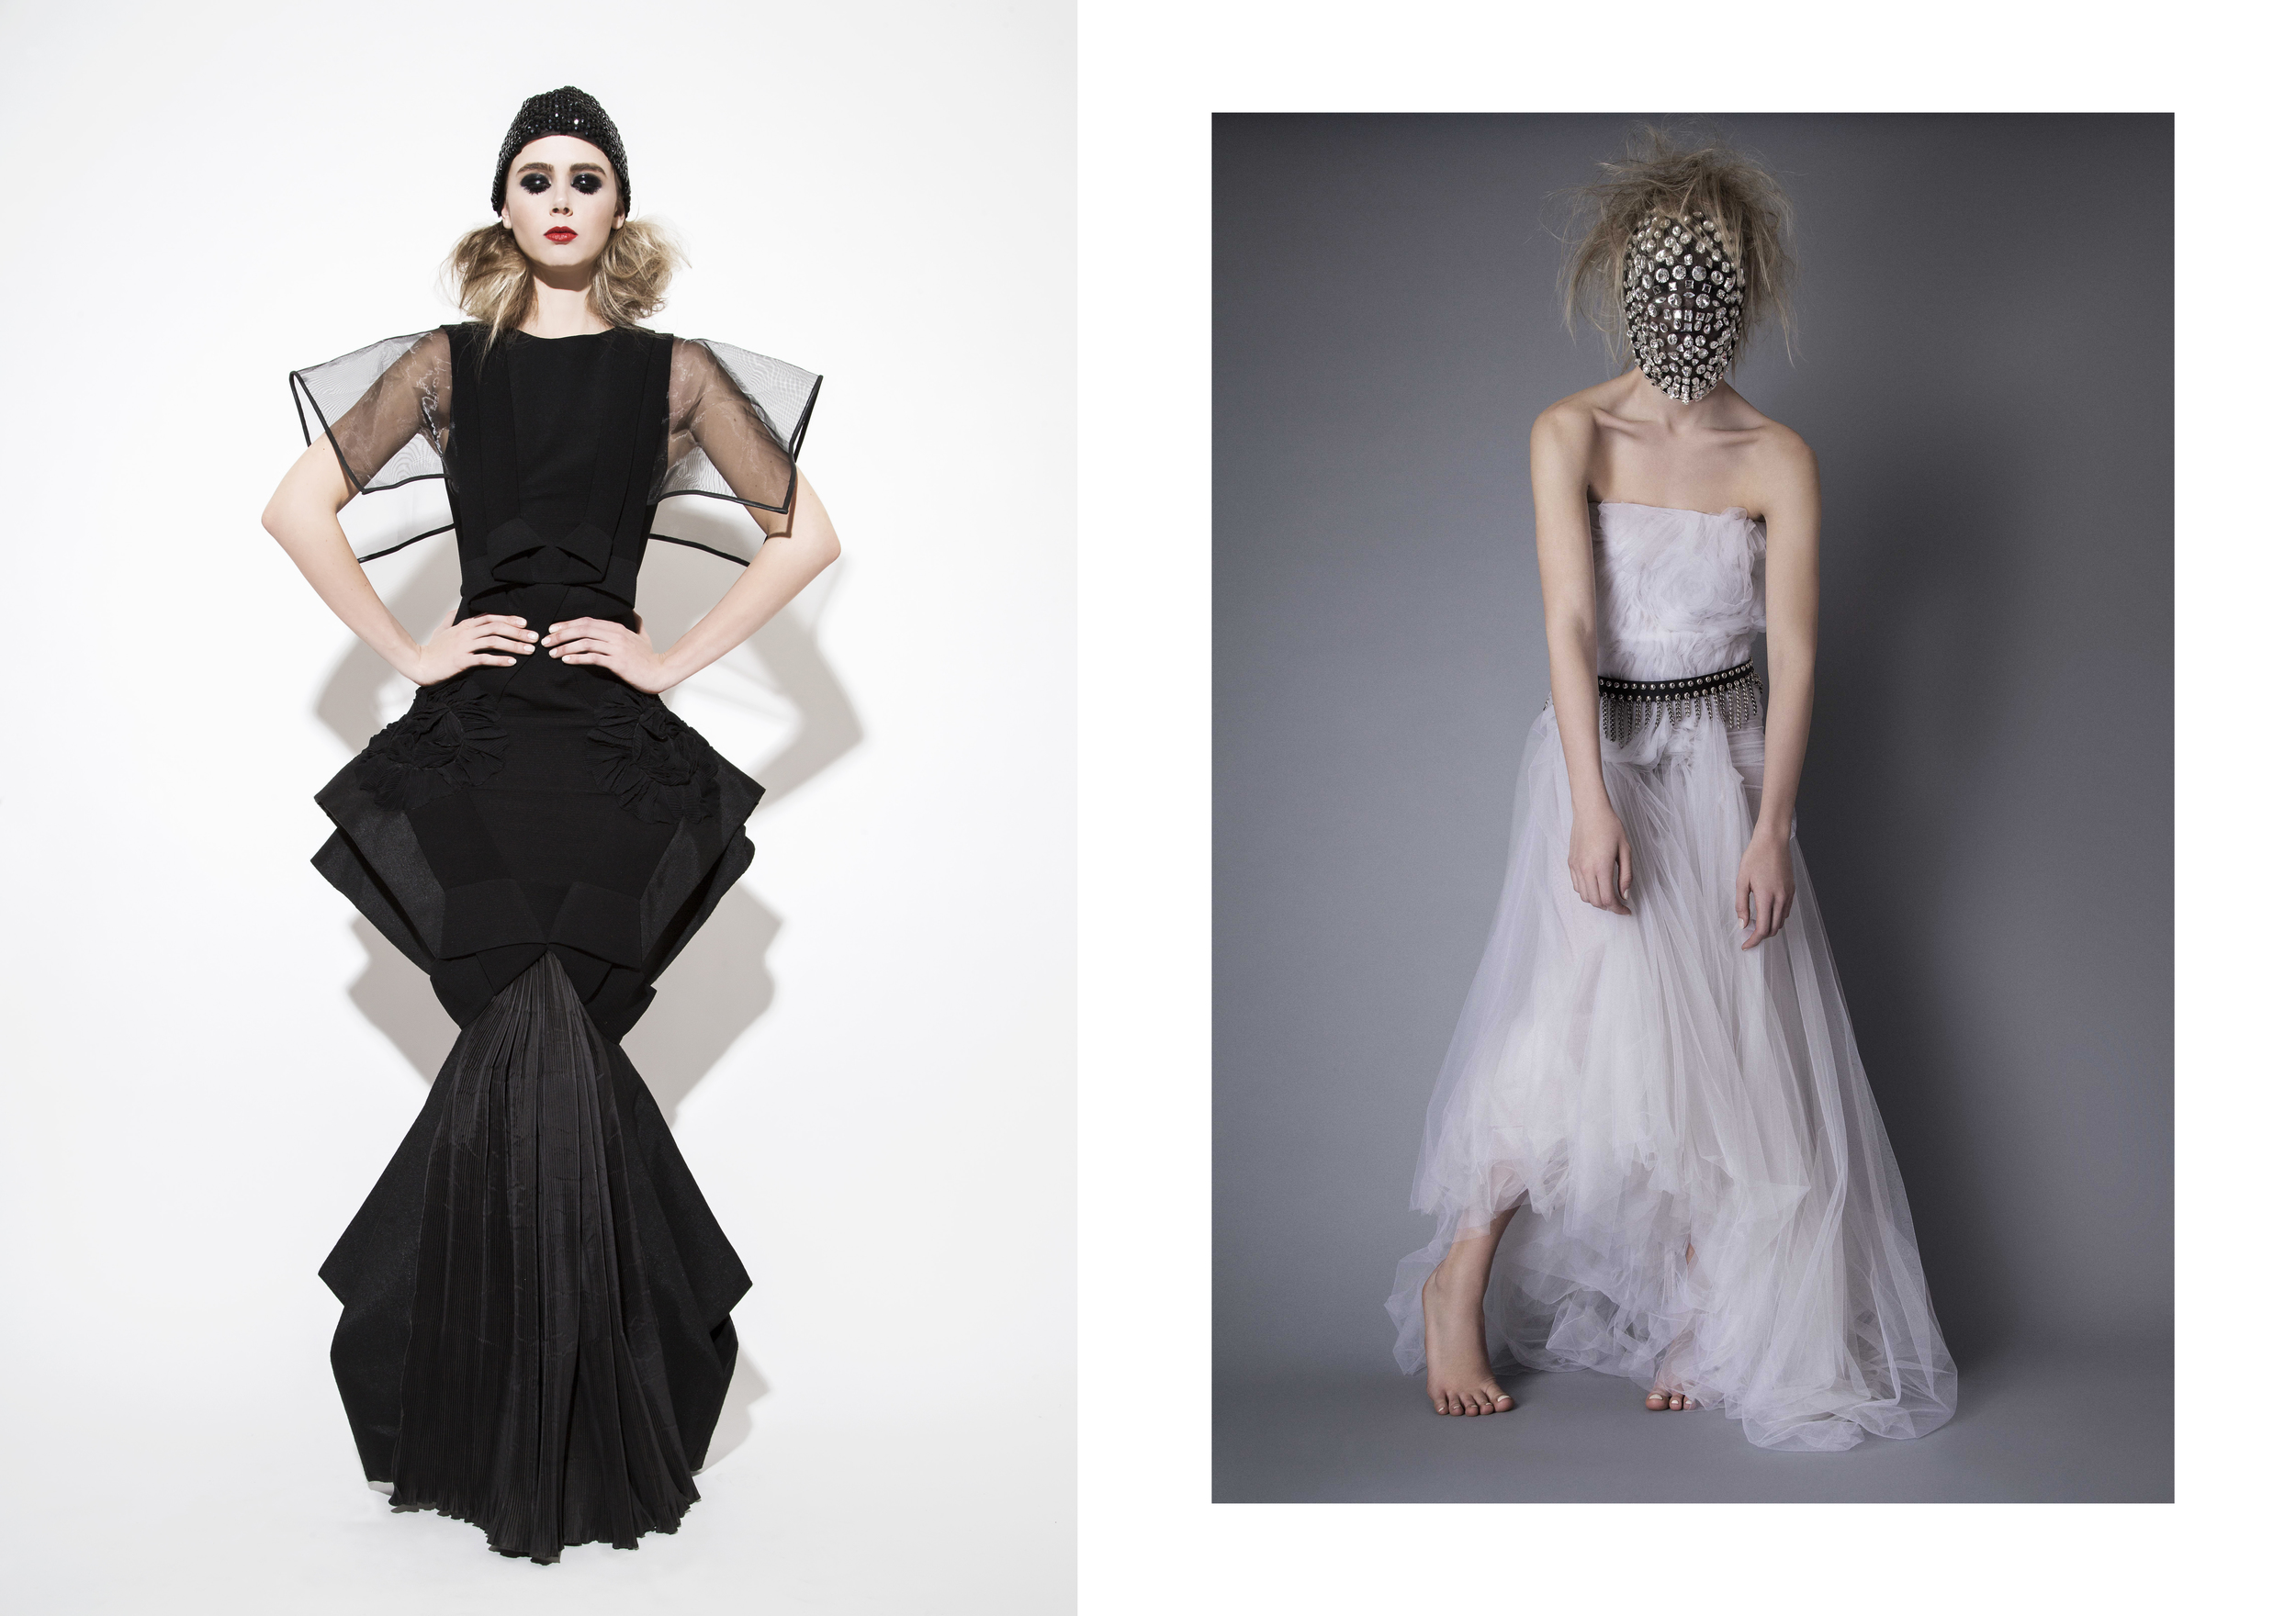 Left - Dress : Alpana Neeraj / Headpiece : Cutting Edge Archives Right - Dress : Jad Ghandour / Headpiece : Cutting Edge Archives